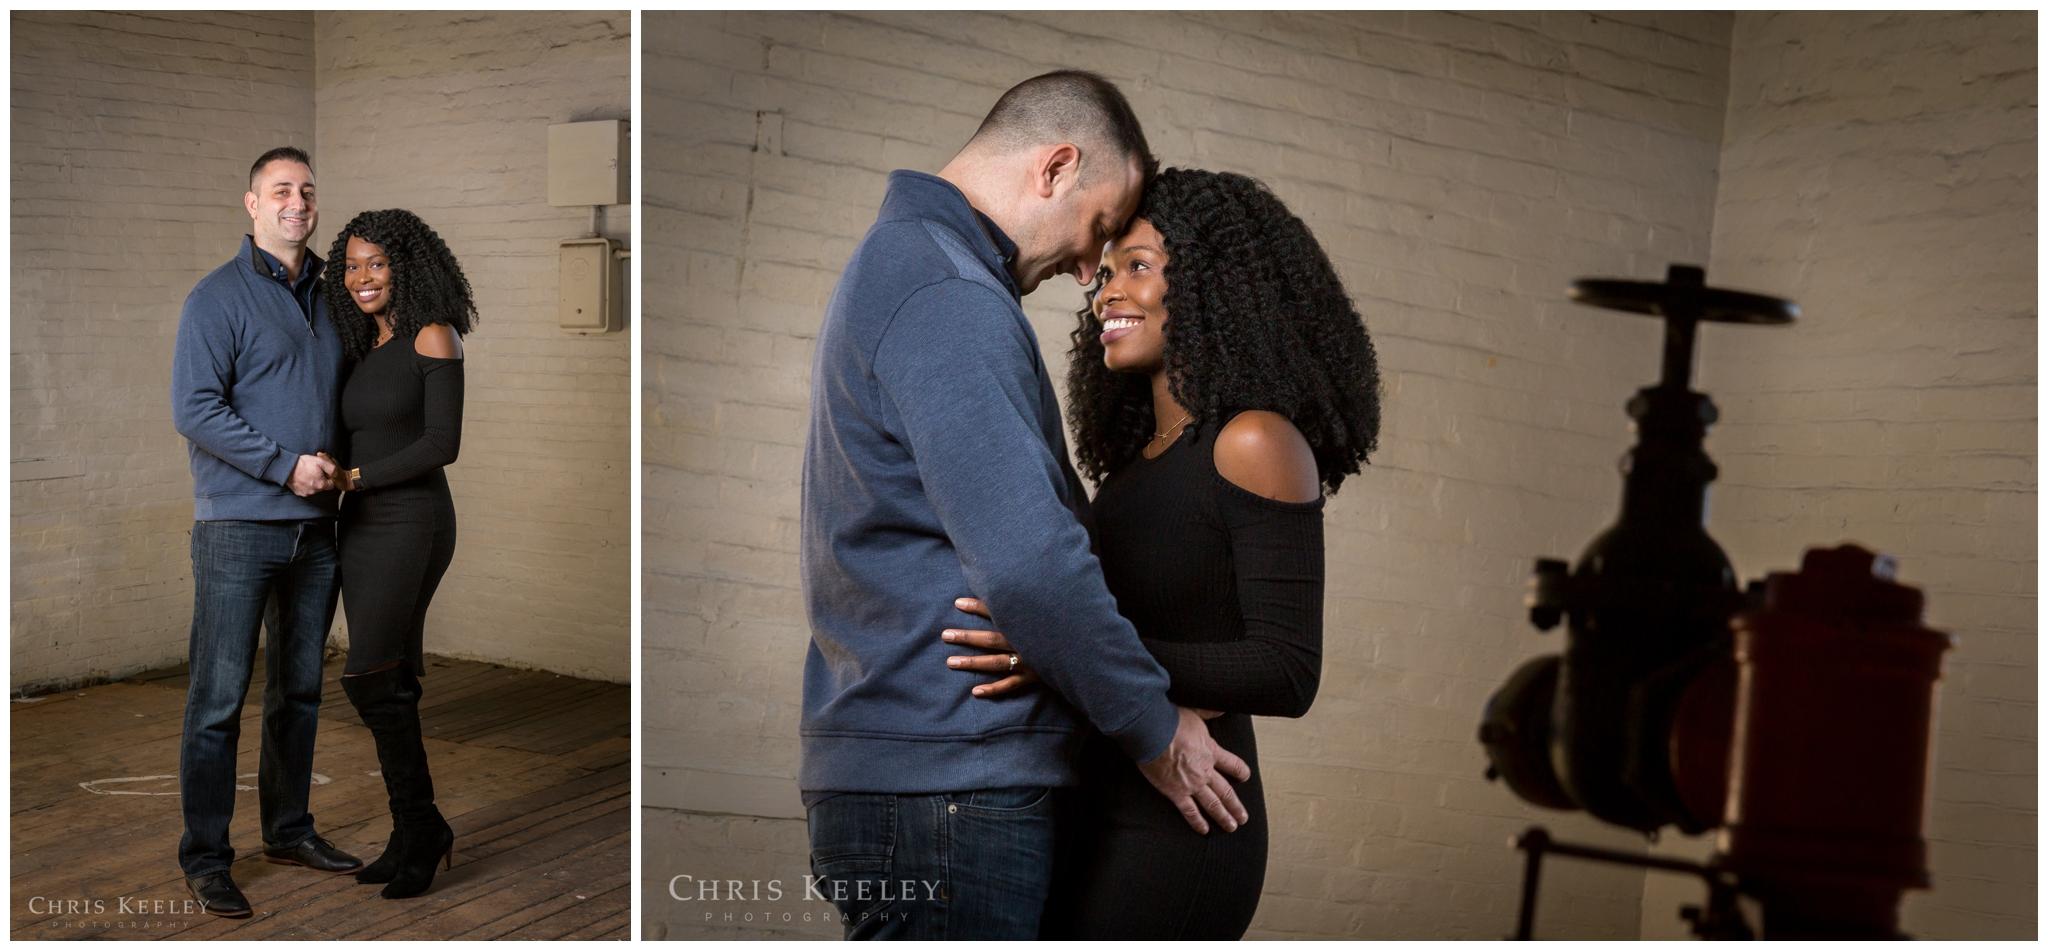 chris-keeley-photography-dover-new-hampshire-engagement-wedding-08.jpg